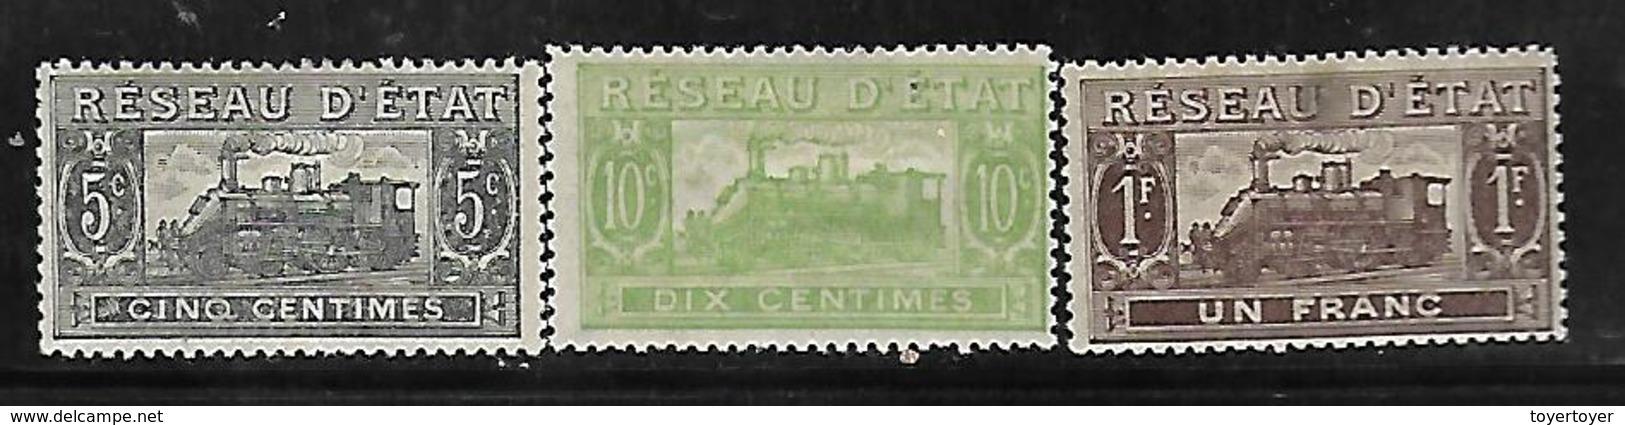 Fg187  France Colis Postaux N°9-10-13 N+ - Colis Postaux